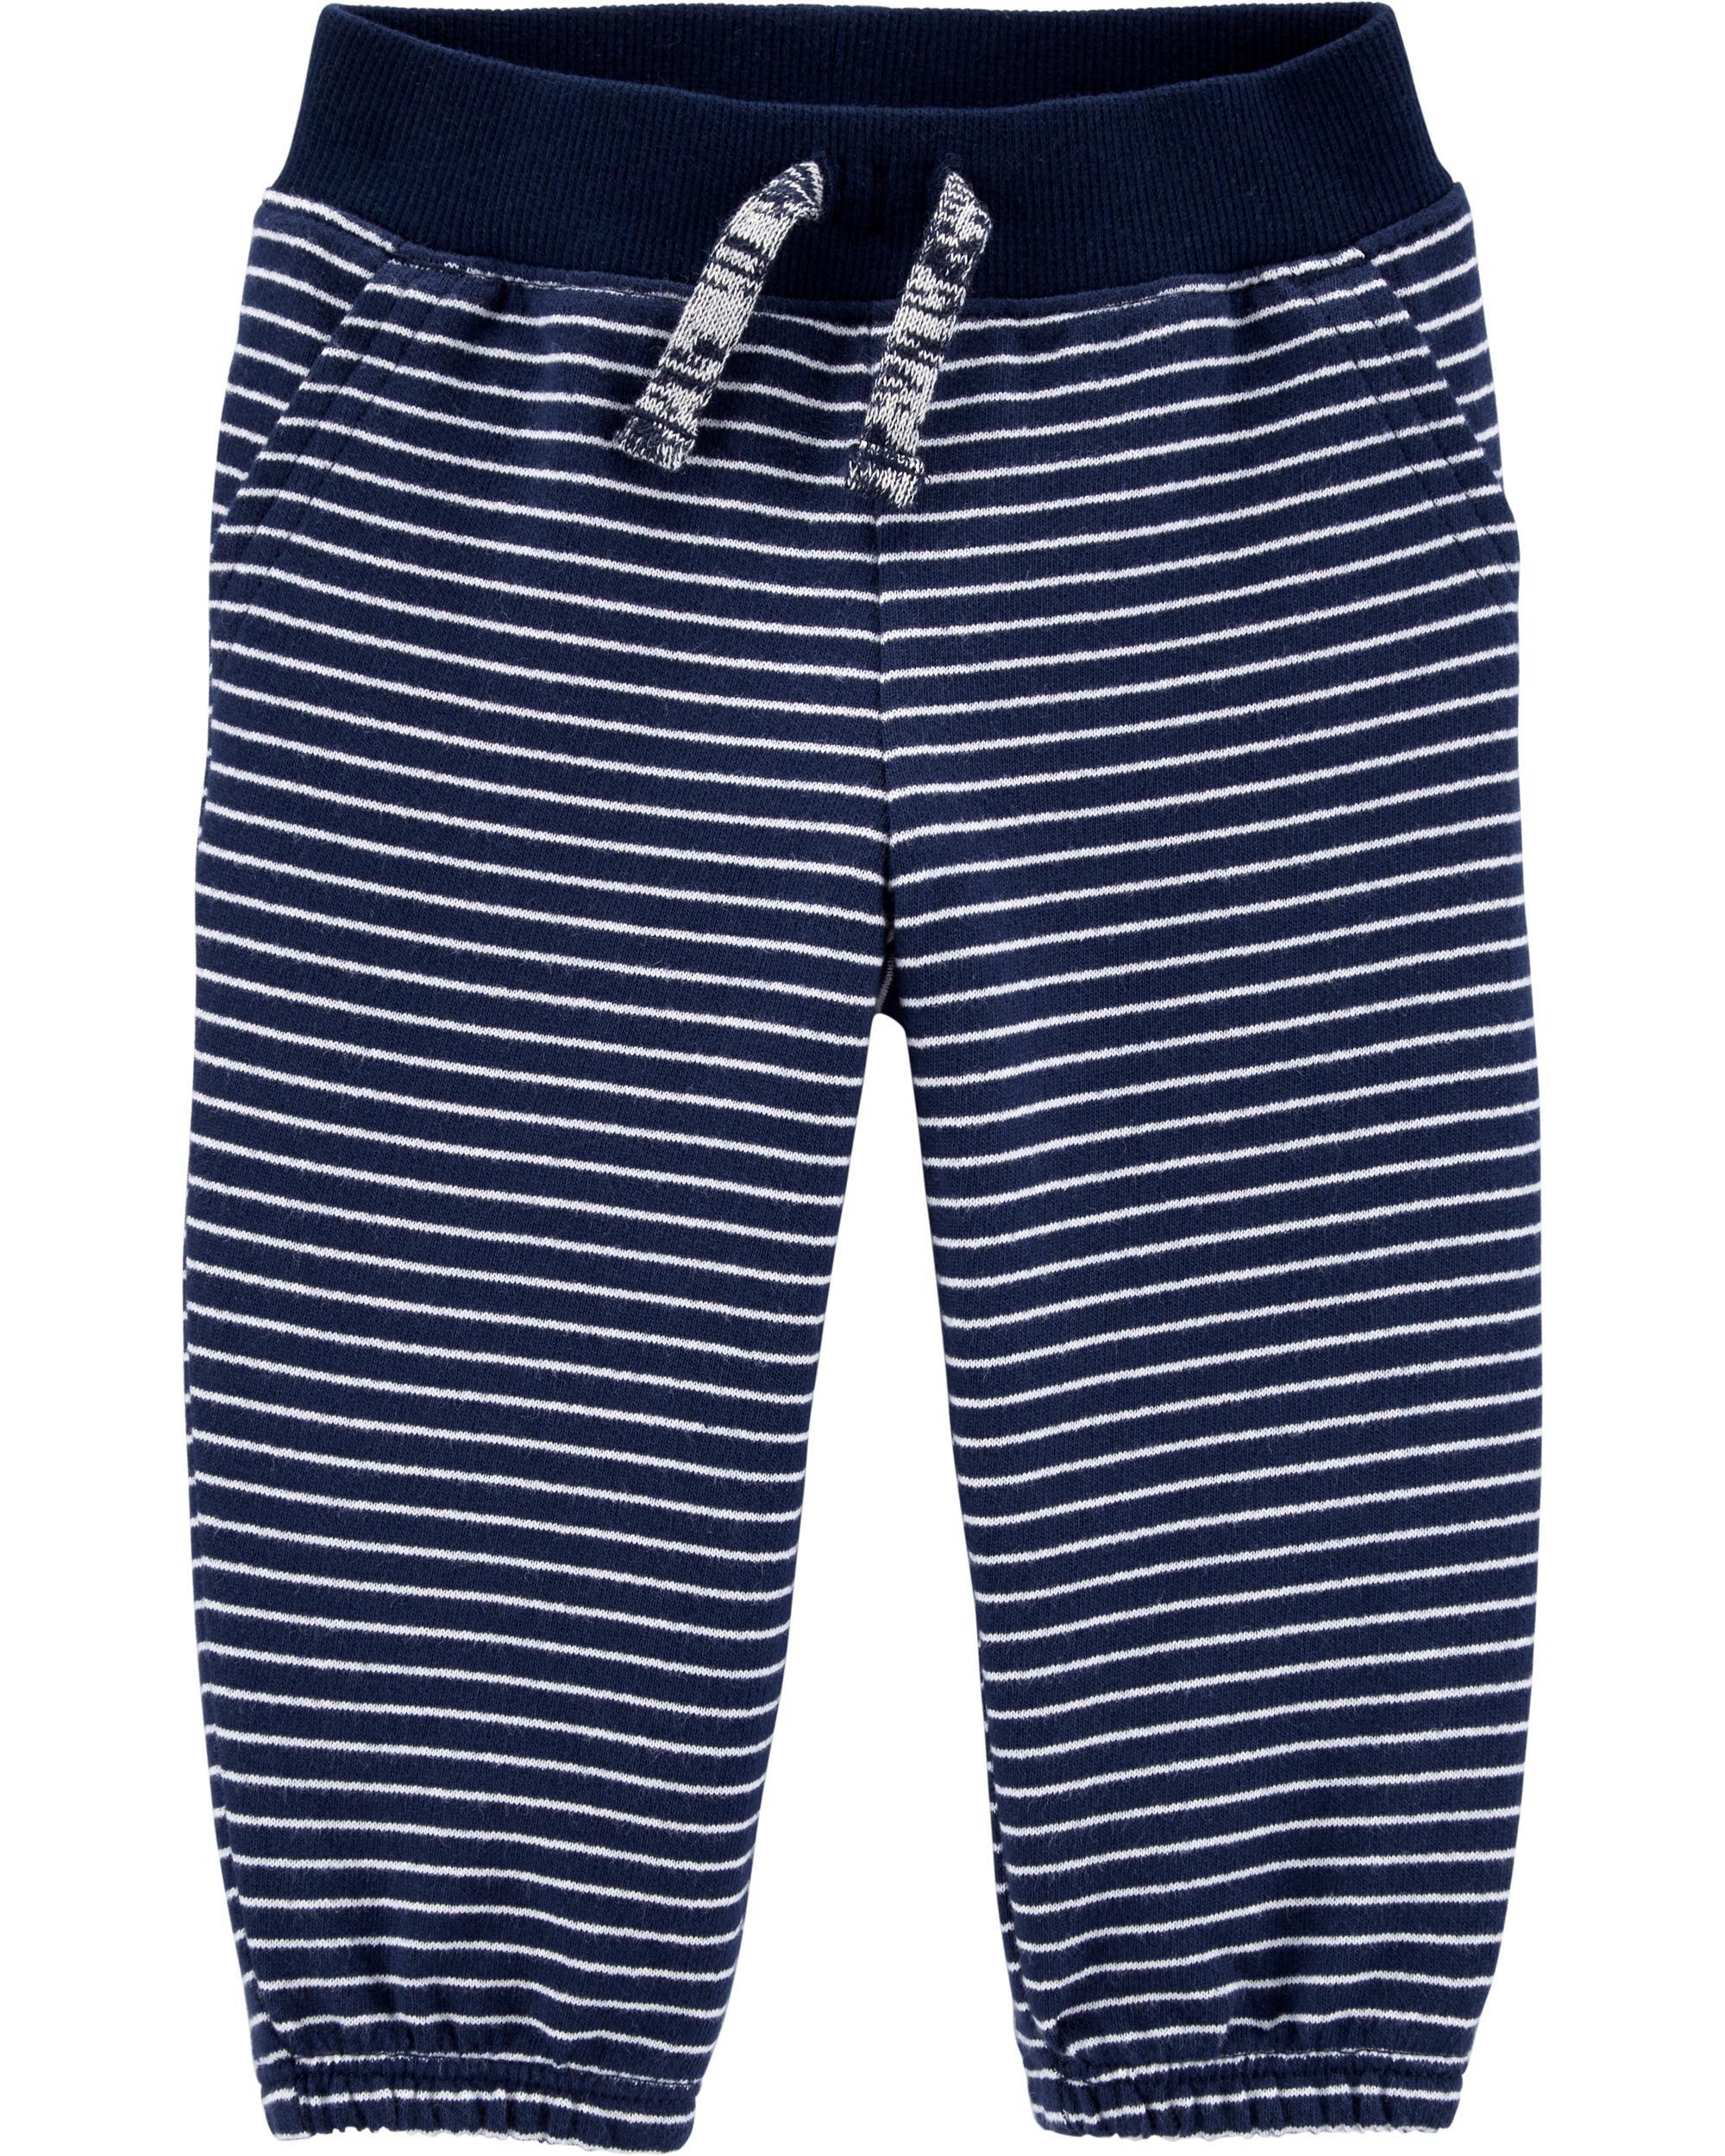 5 Kids Carters Little Boys Blue Stripe Pull On Shorts